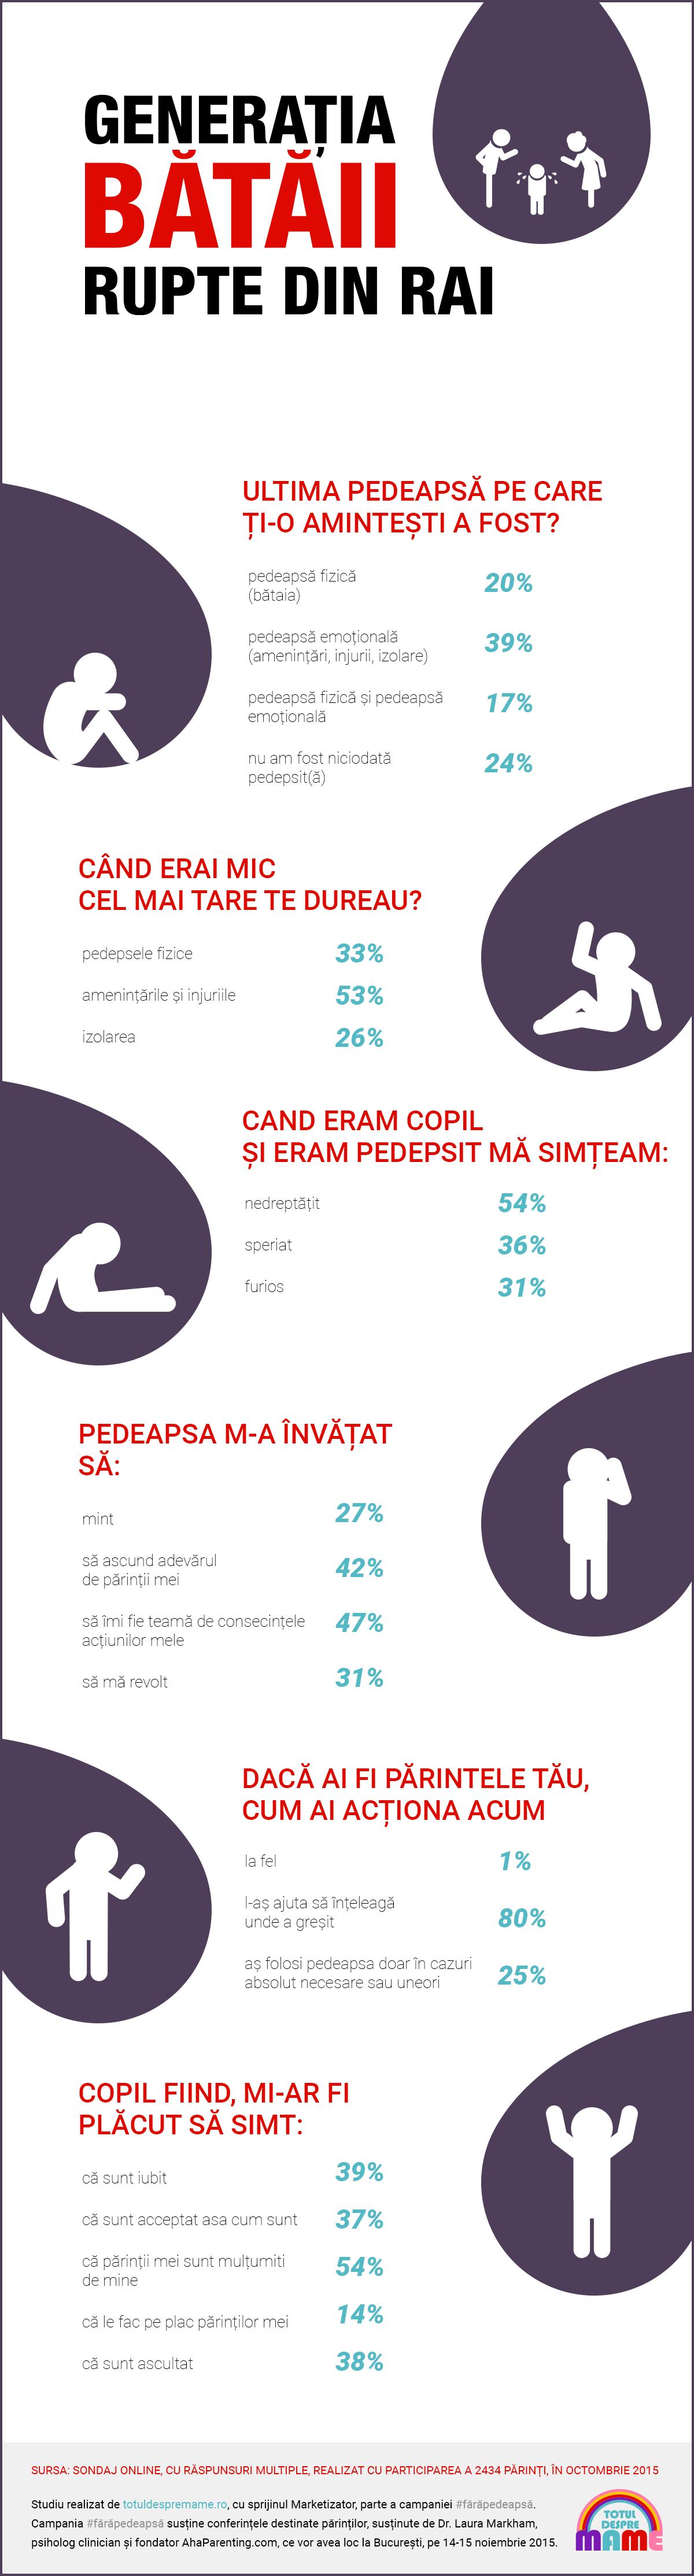 Infografia GENERATIA BATAII RUPTE DIN RAI